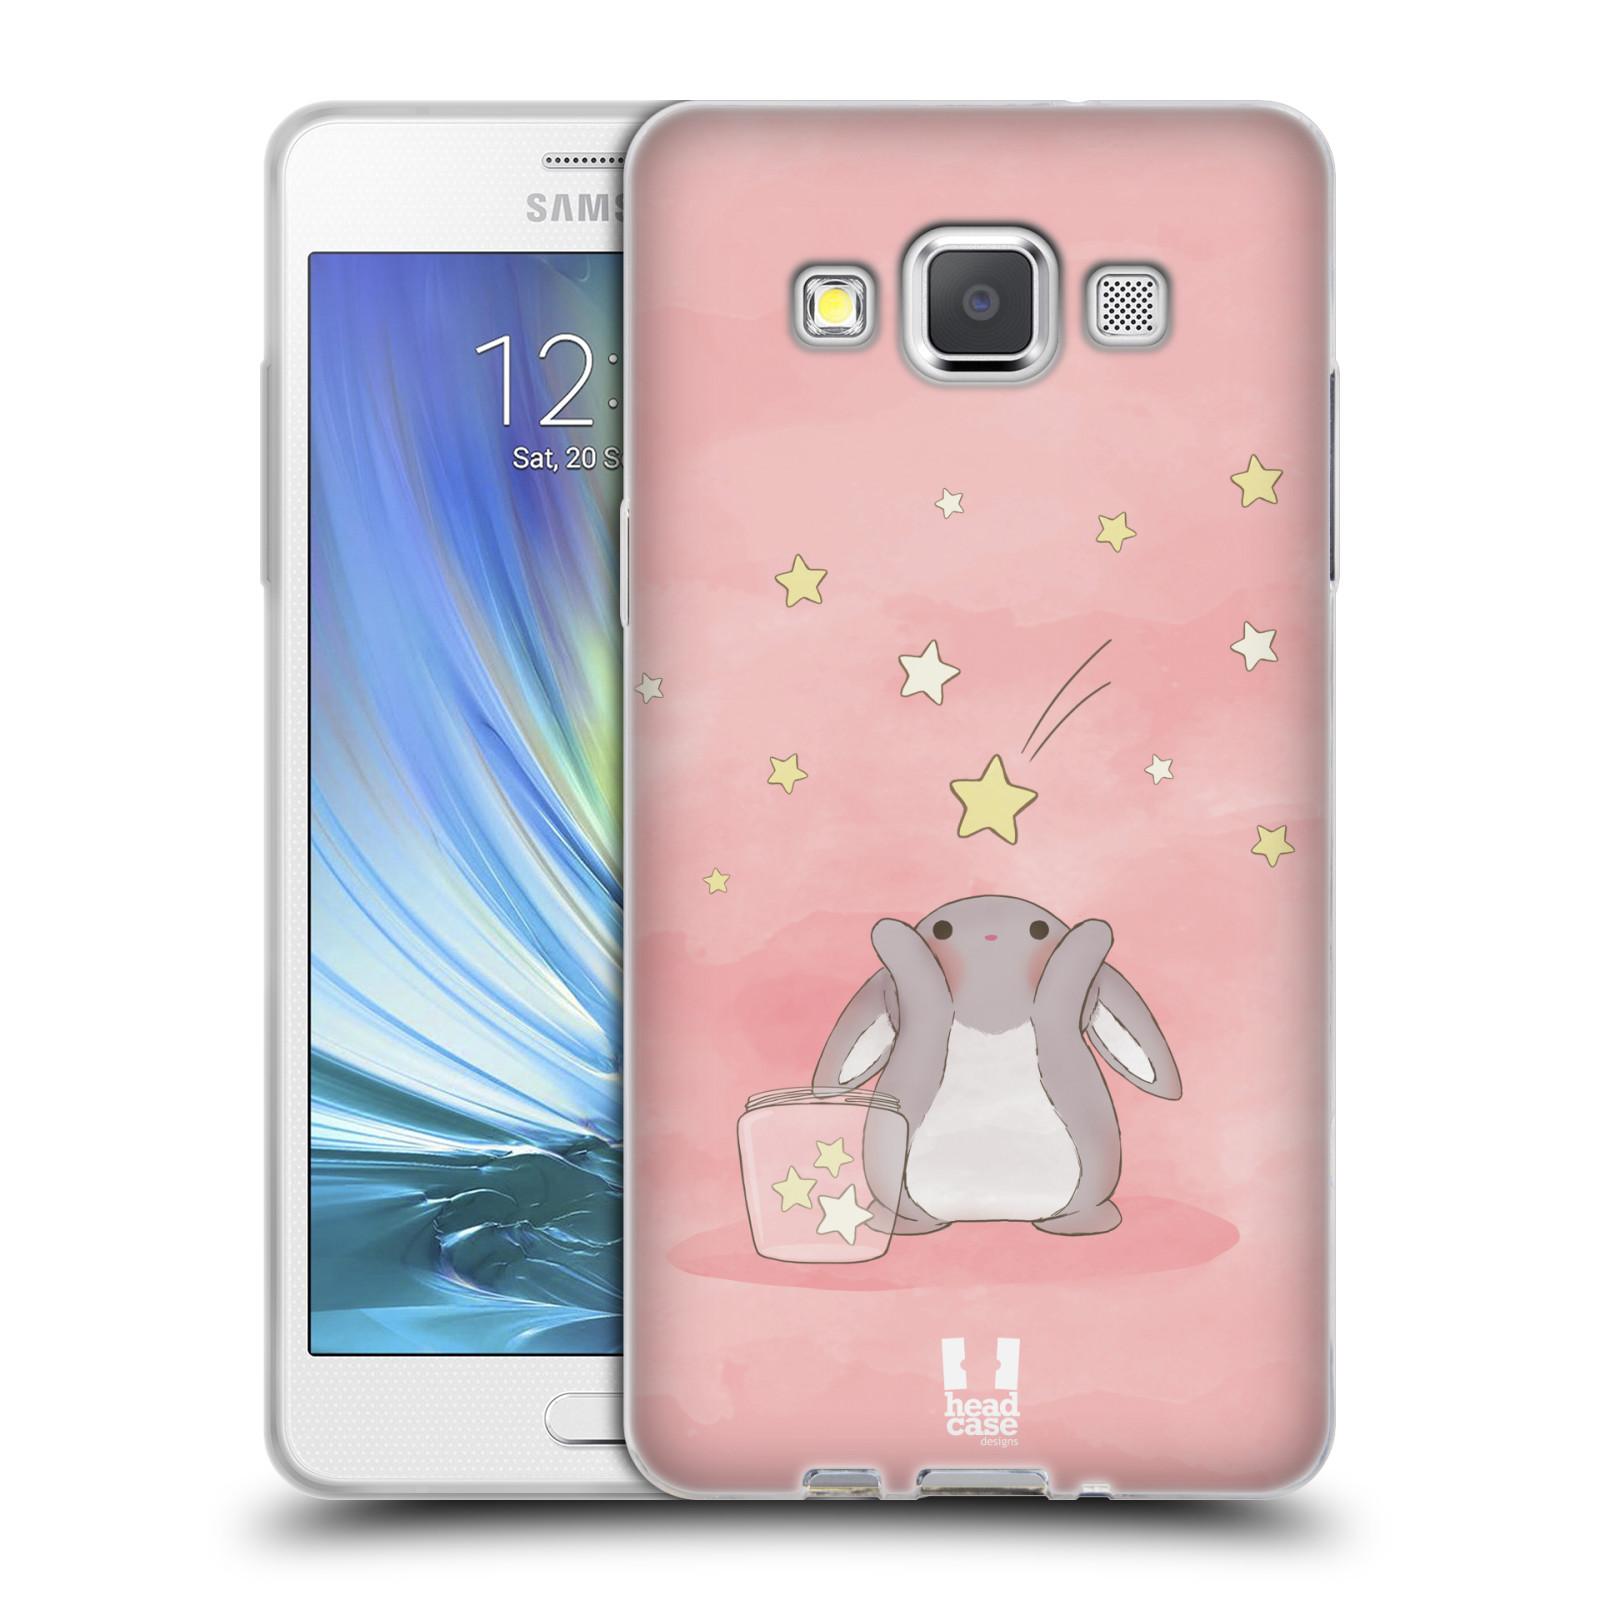 HEAD CASE silikonový obal na mobil Samsung Galaxy A5 vzor králíček a hvězdy růžová